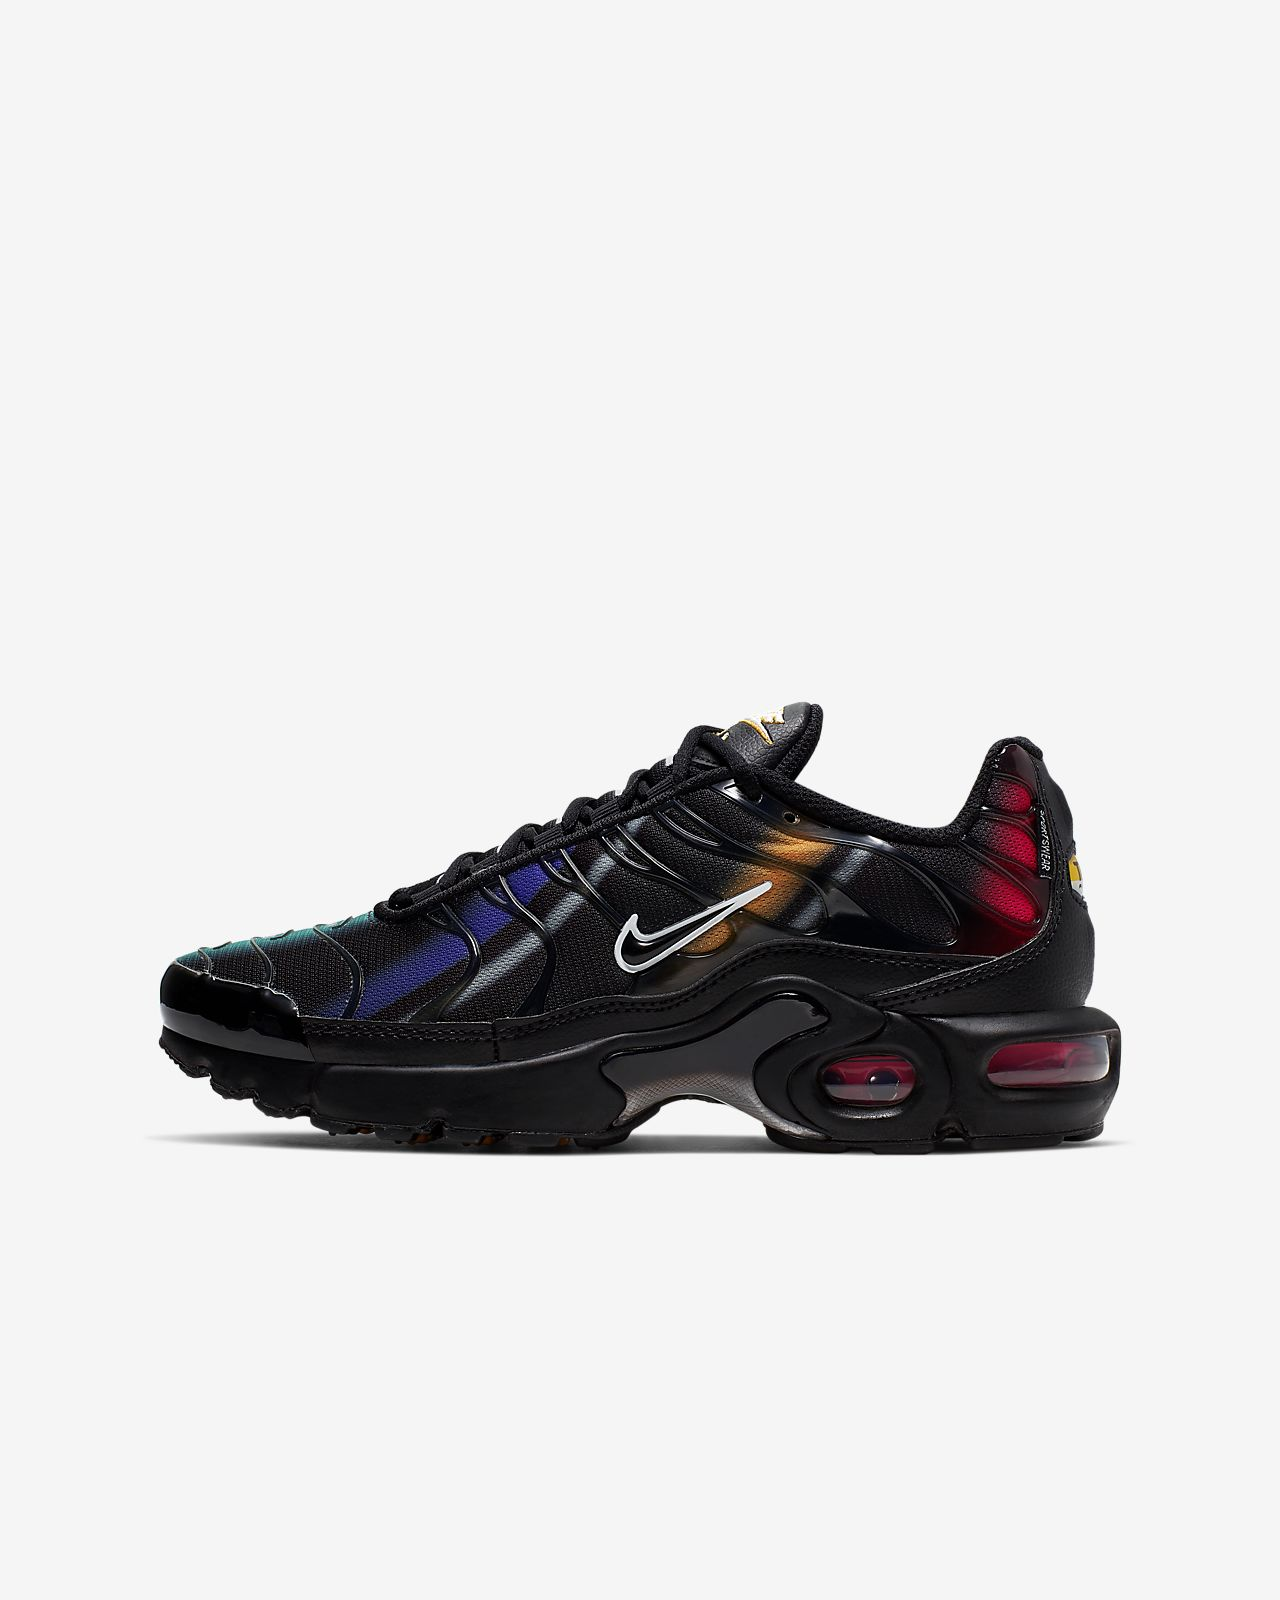 Buty dla dużych dzieci Nike Air Max Plus Game